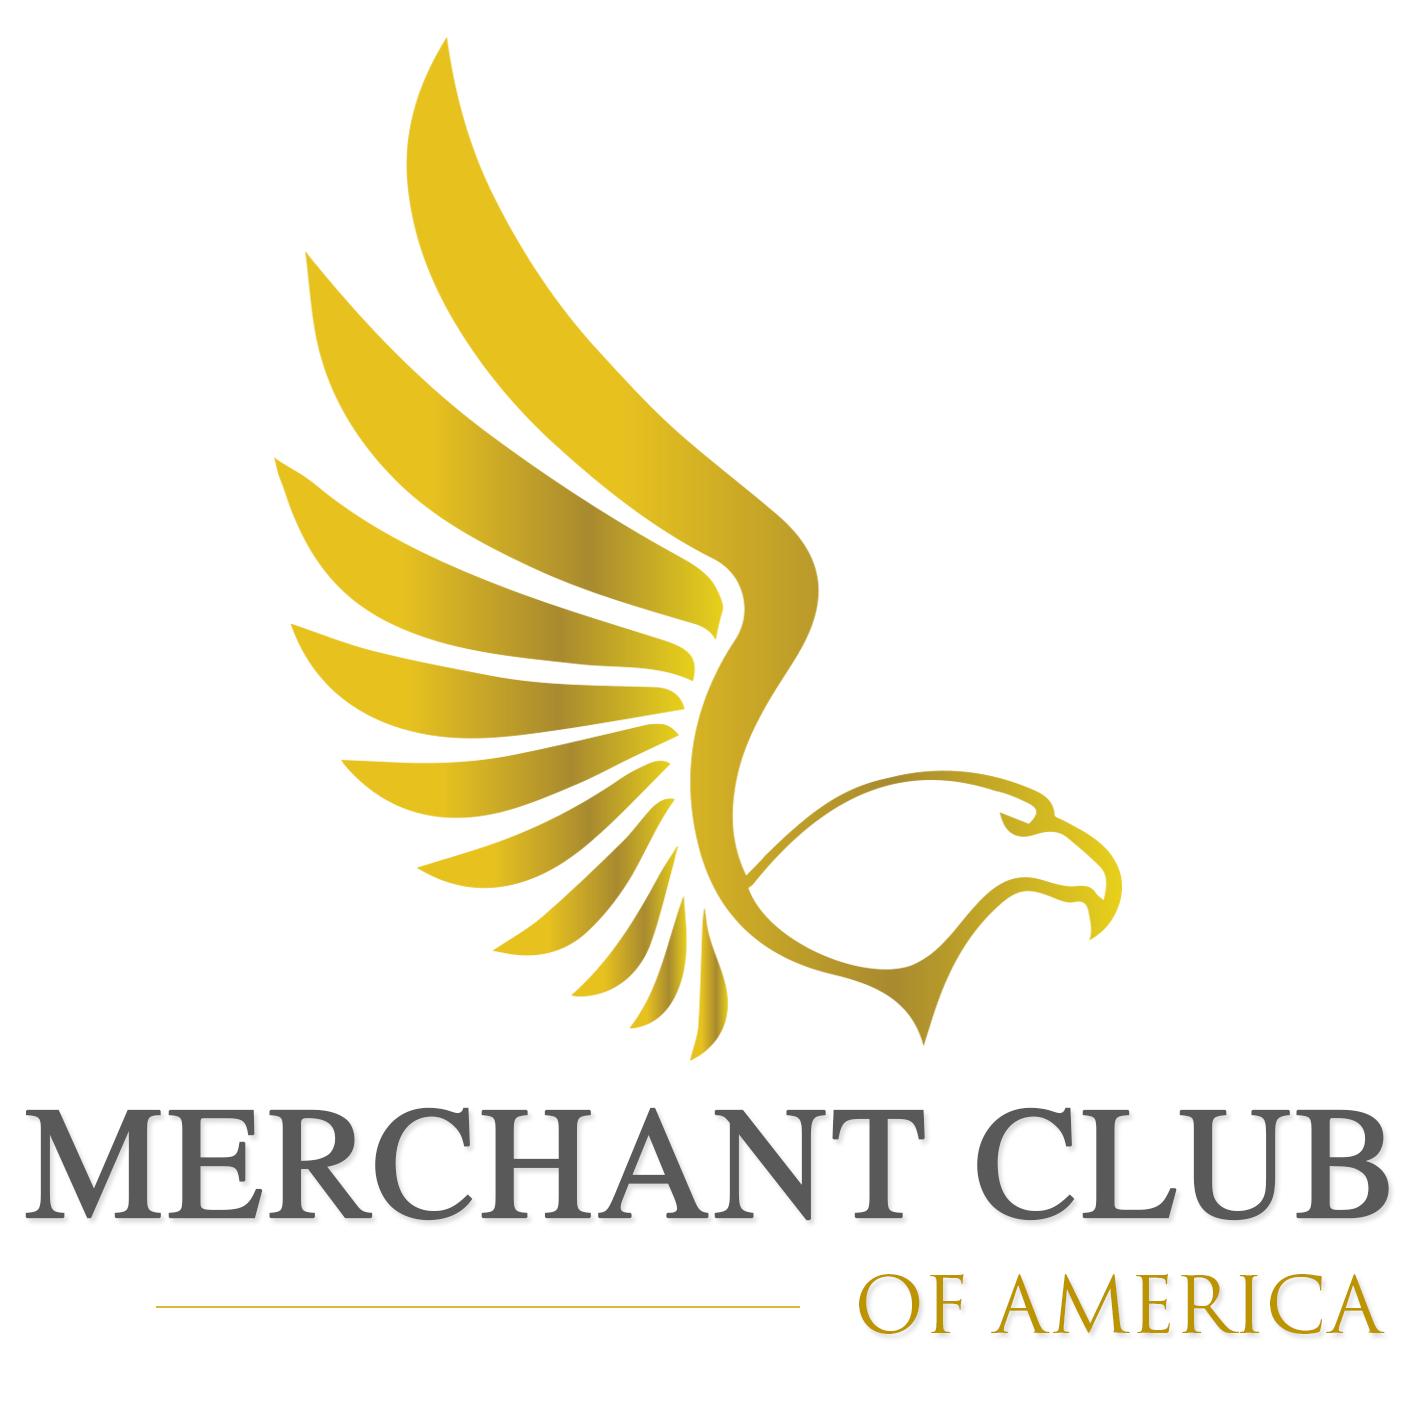 Merchant Club of America Logo